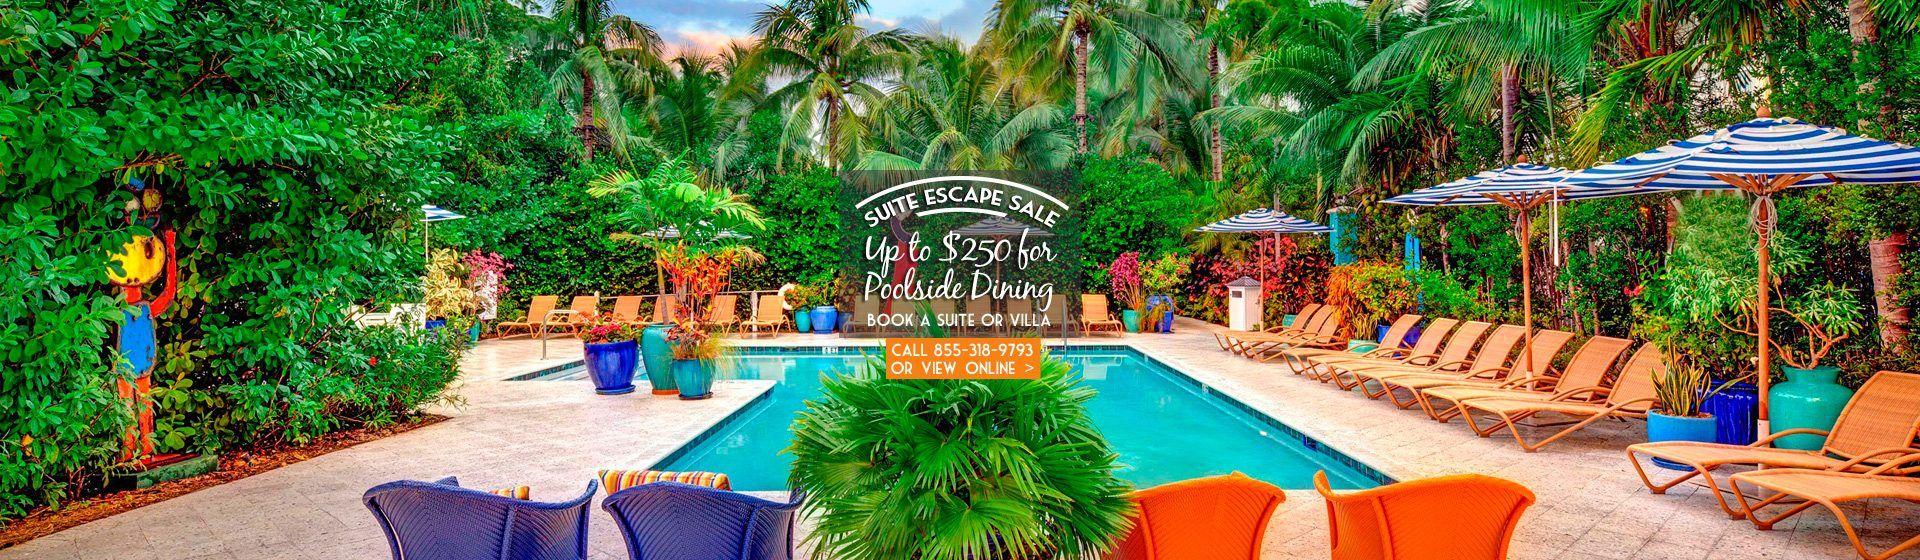 Parrot Key Hotel and Resort 2801 N Roosevelt Blvd, Key West, FL 33040 From: $250